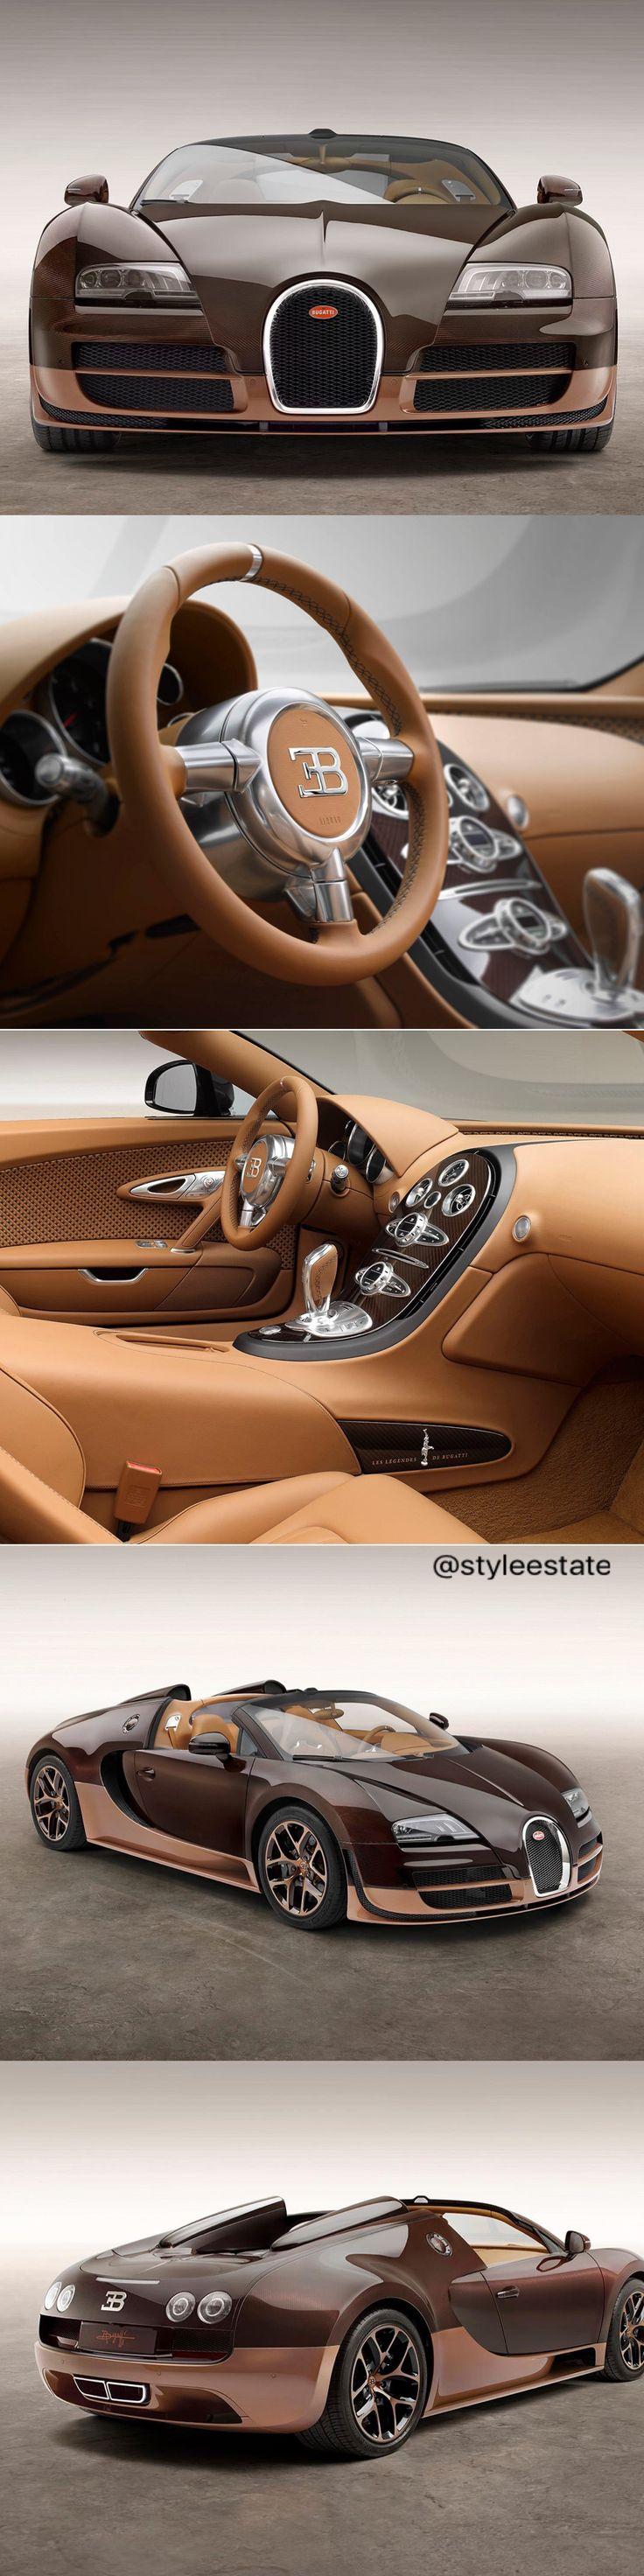 8dac56ffde9b759a194b228375cedad9--rembrandt-car-interiors Extraordinary N°5 Bugatti Veyron Grand Sport Vitesse Cars Trend